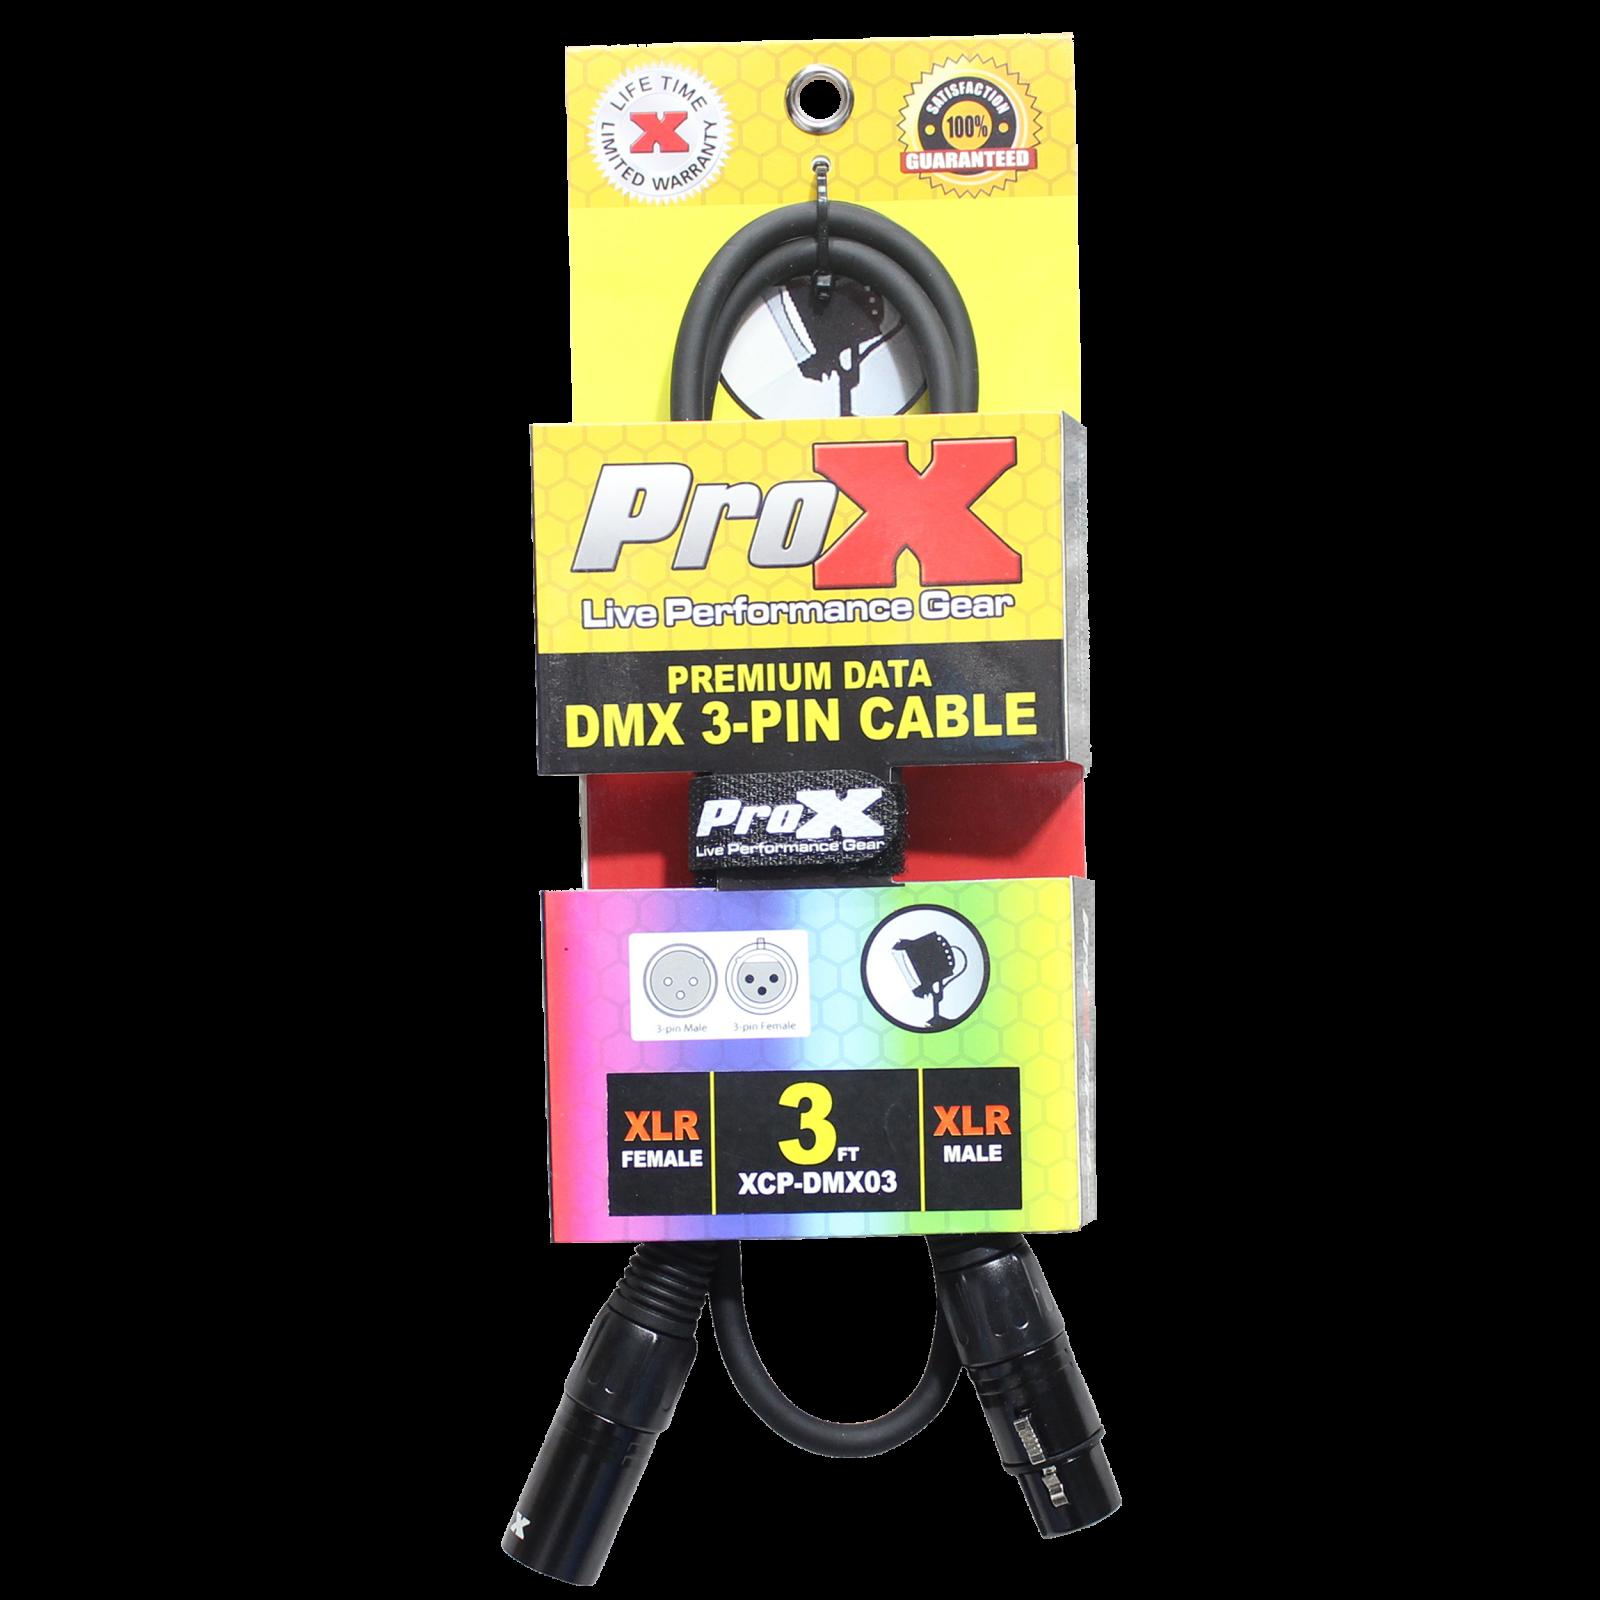 ProX Premium 3PIN DMX Cable